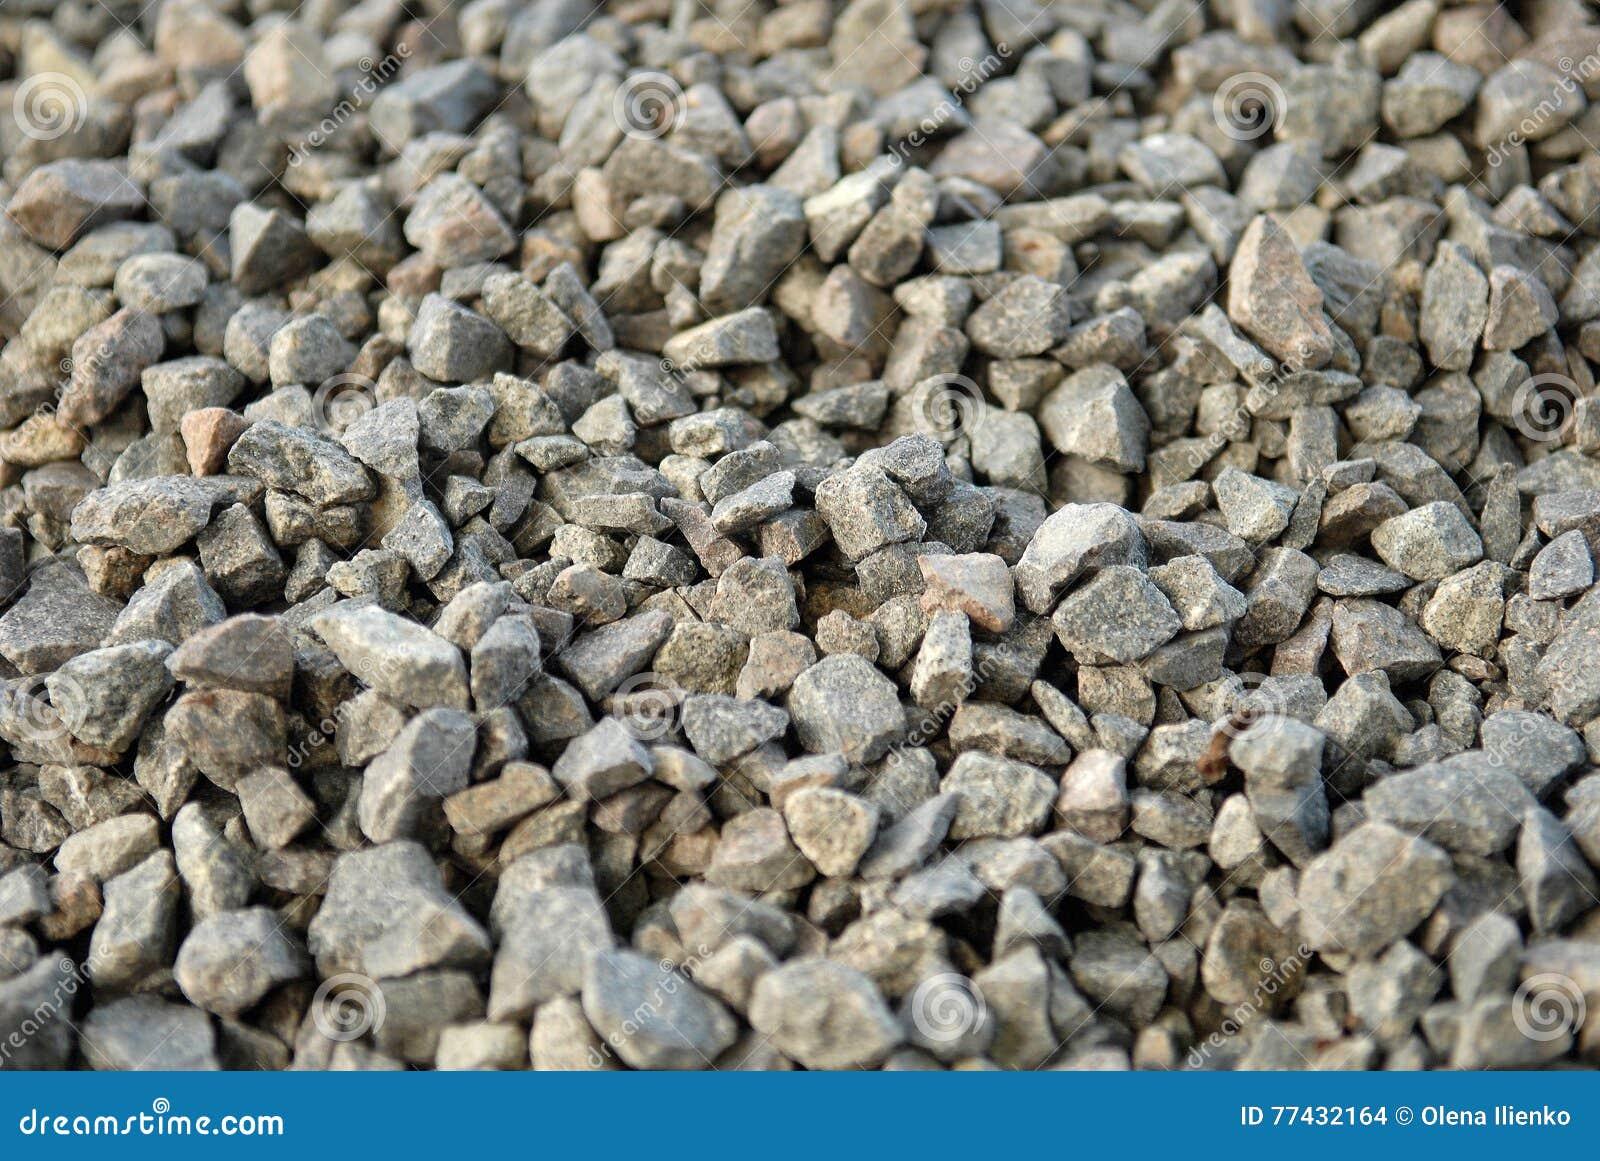 Textura de la grava del granito materiales de construcci n for Que es el granito